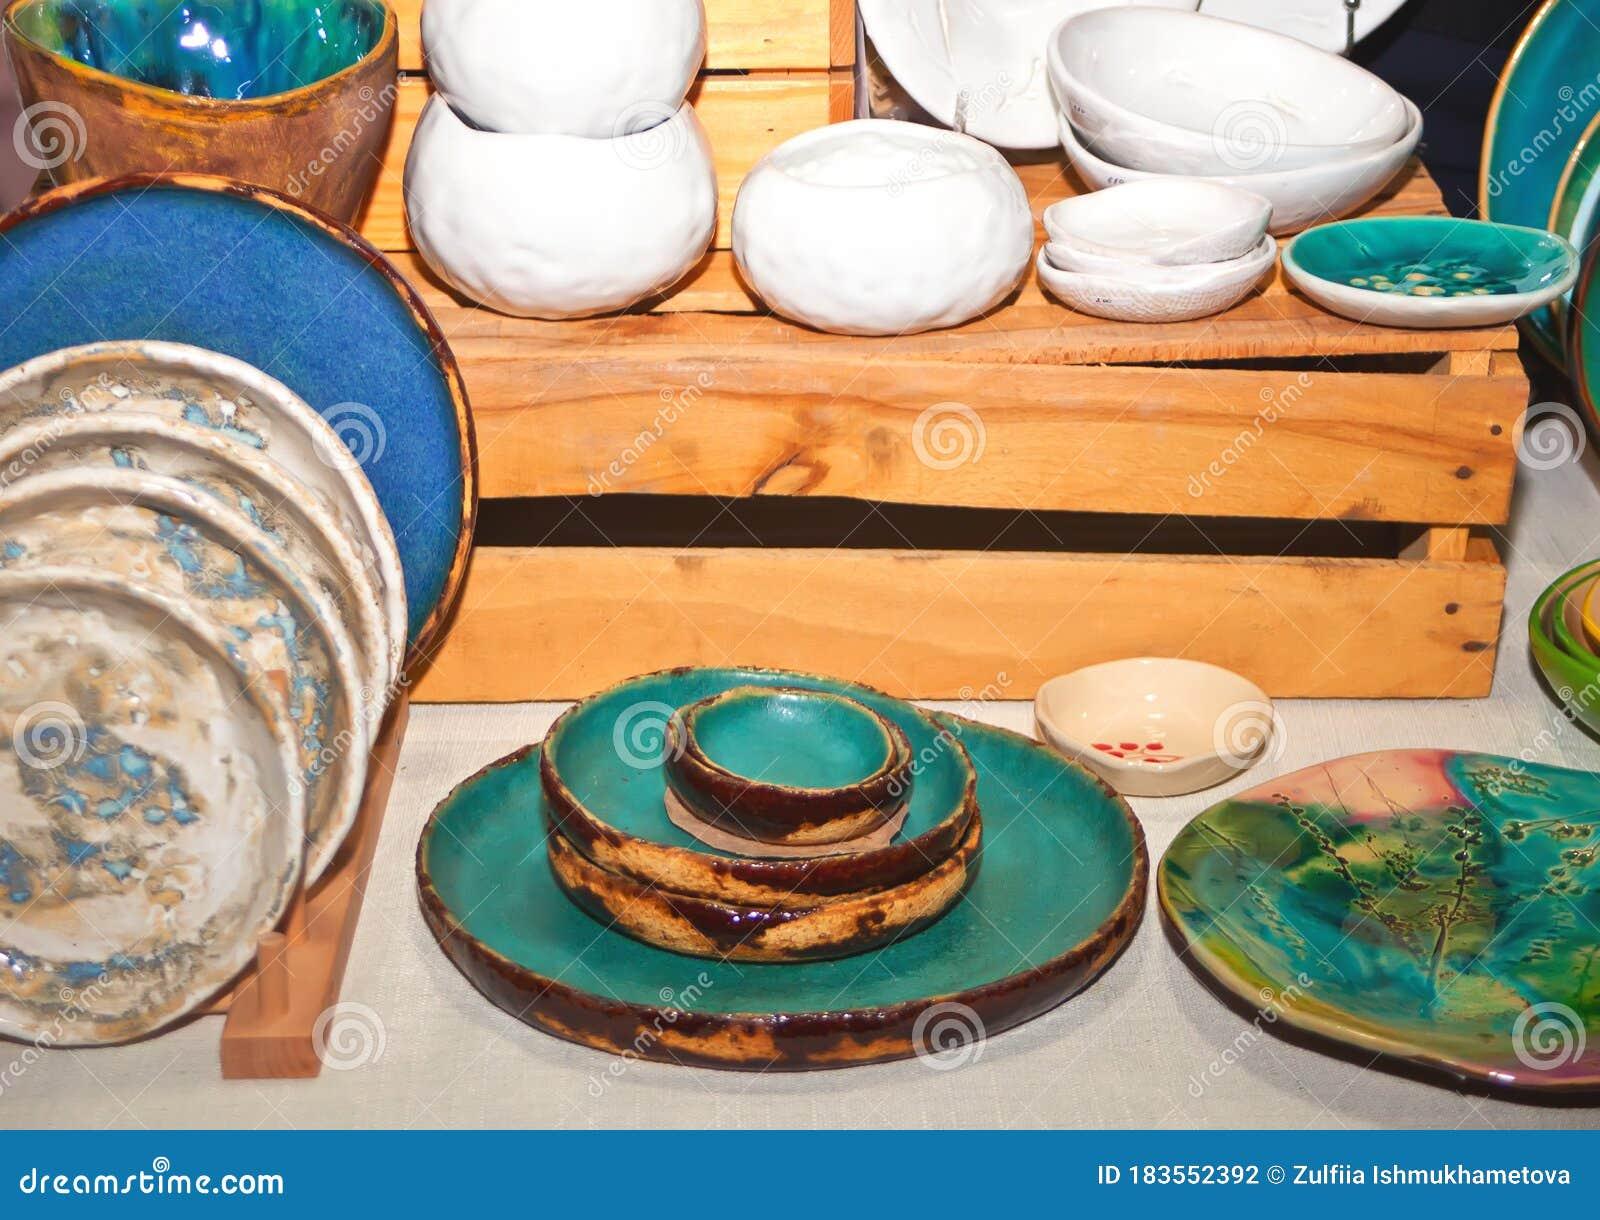 Modern Ceramic Plates In A Street Market Stock Photo Image Of Decor Assortment 183552392